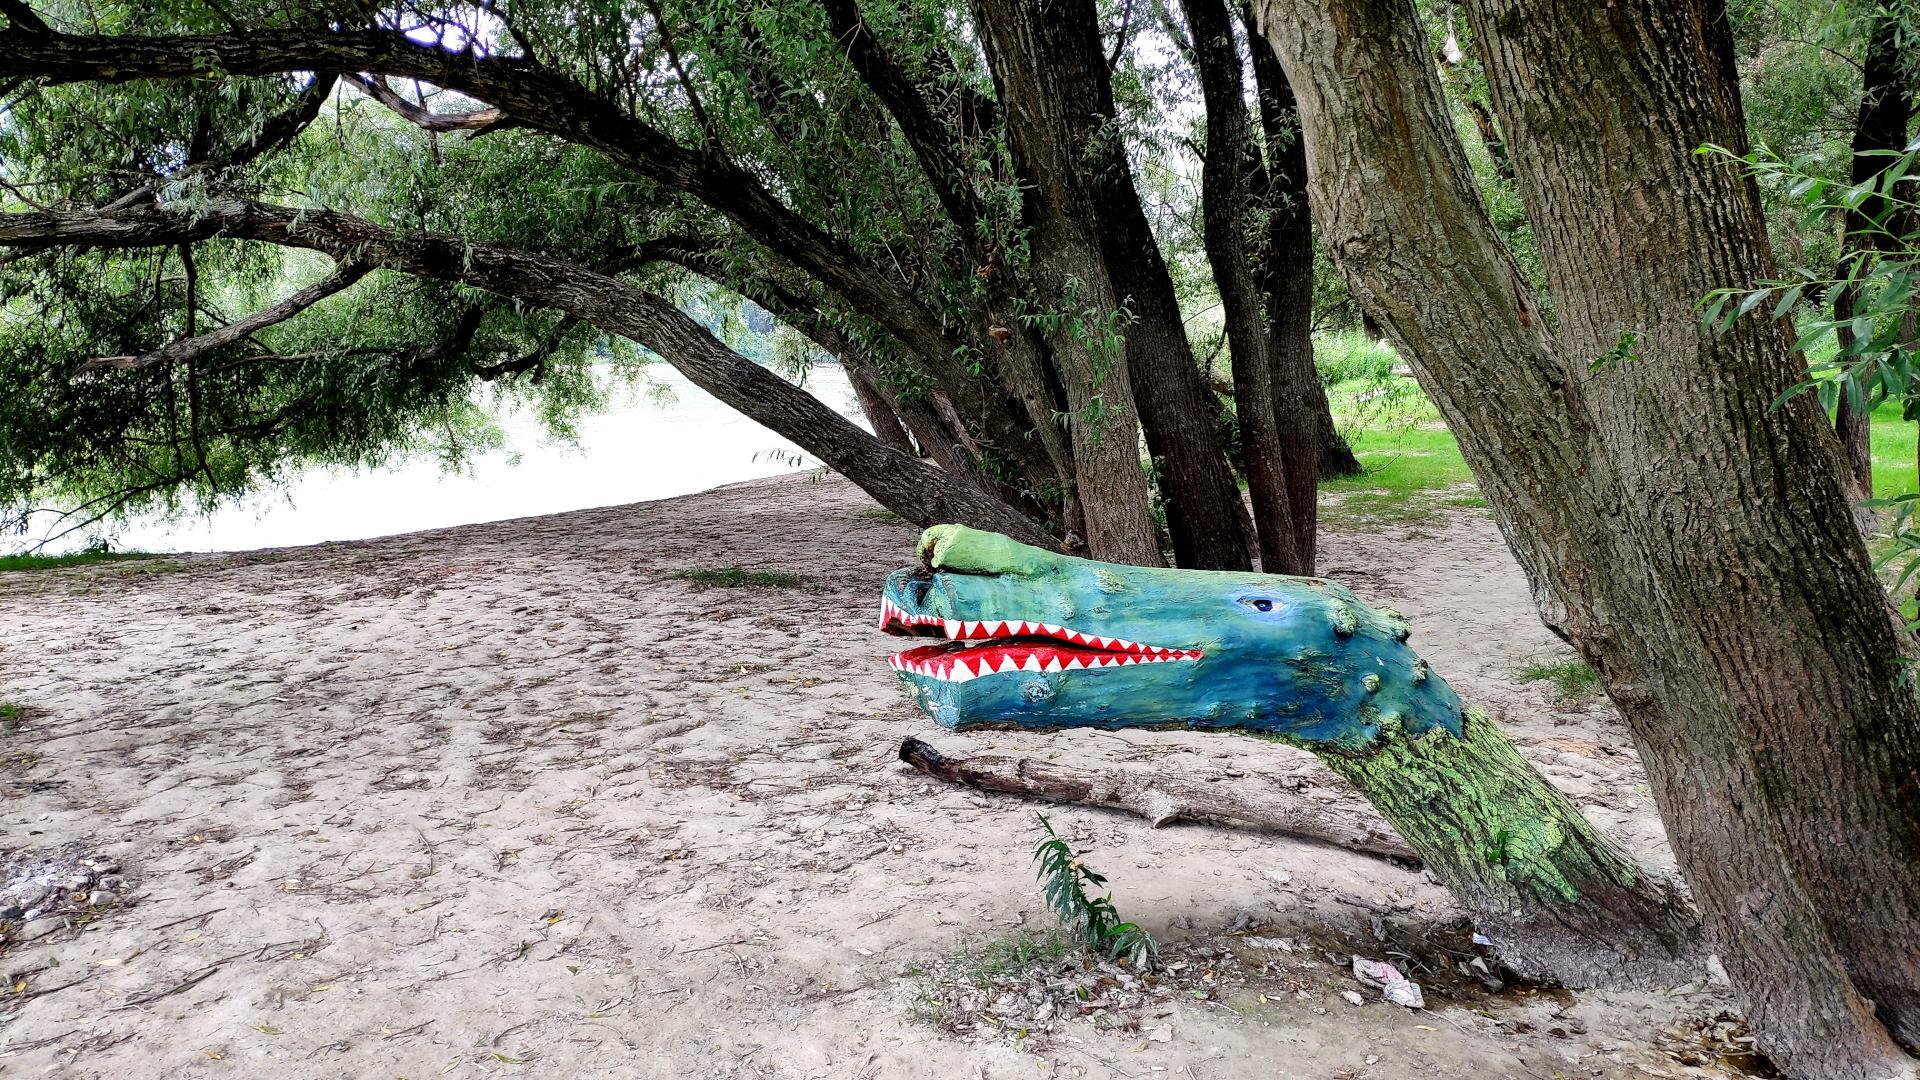 krokodil fatörzsből